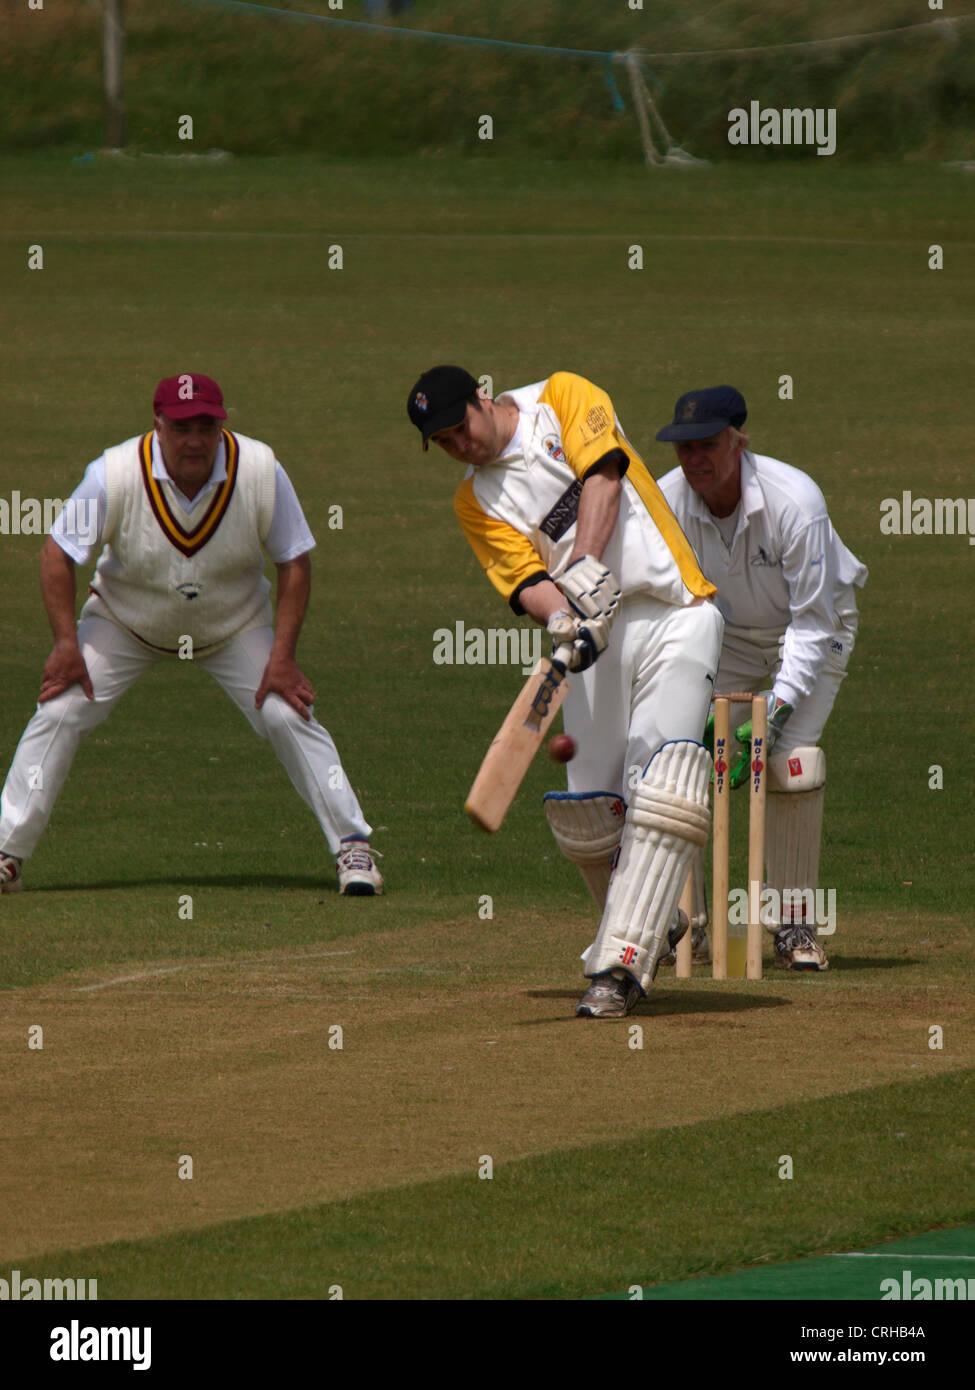 Batsman playing a shot, Bude, Cornwall, UK - Stock Image